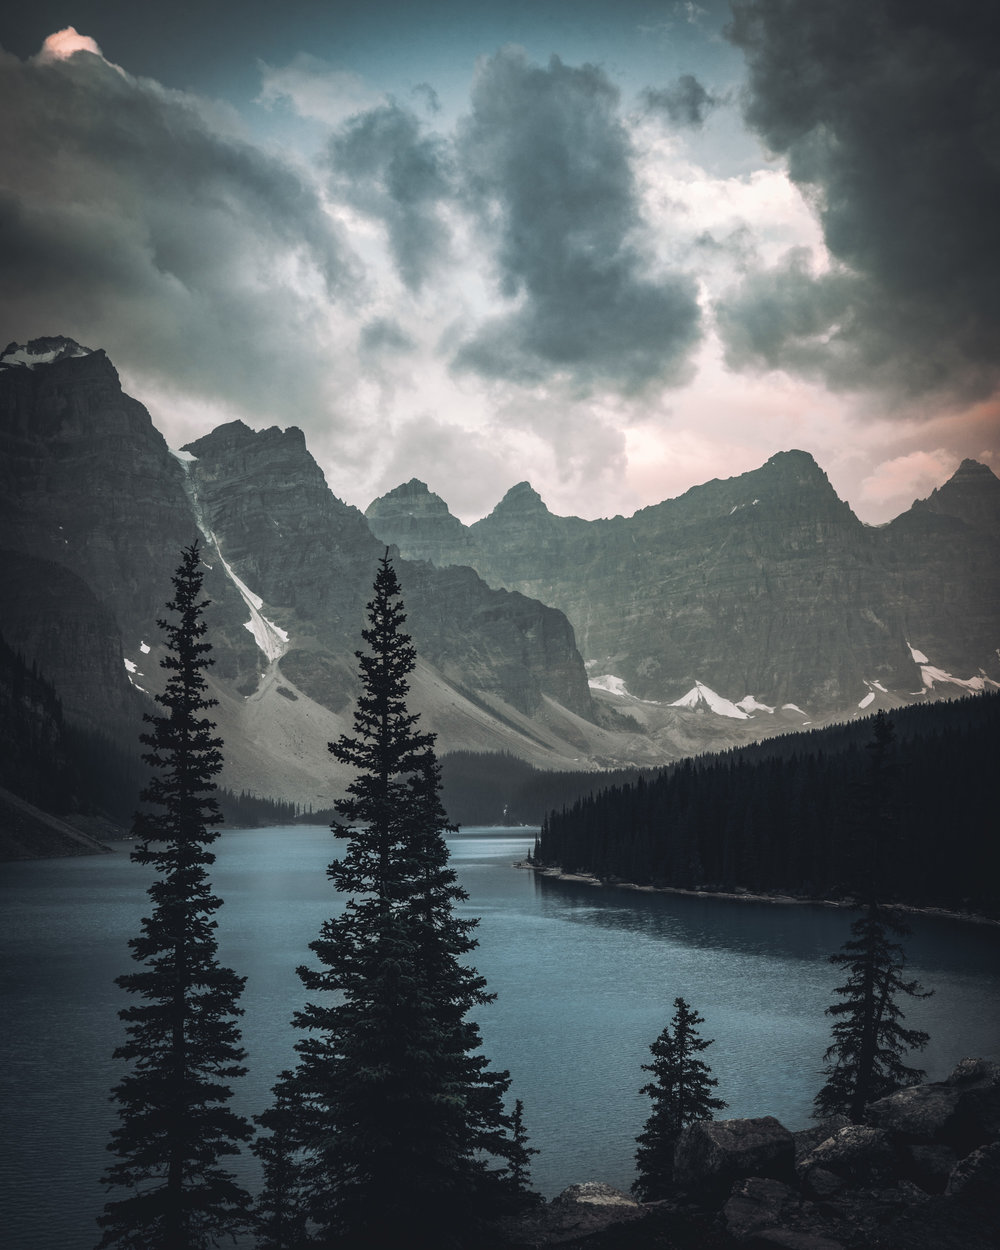 Jason_Bax_SQ_Travel_Canada_BAX4309.jpg